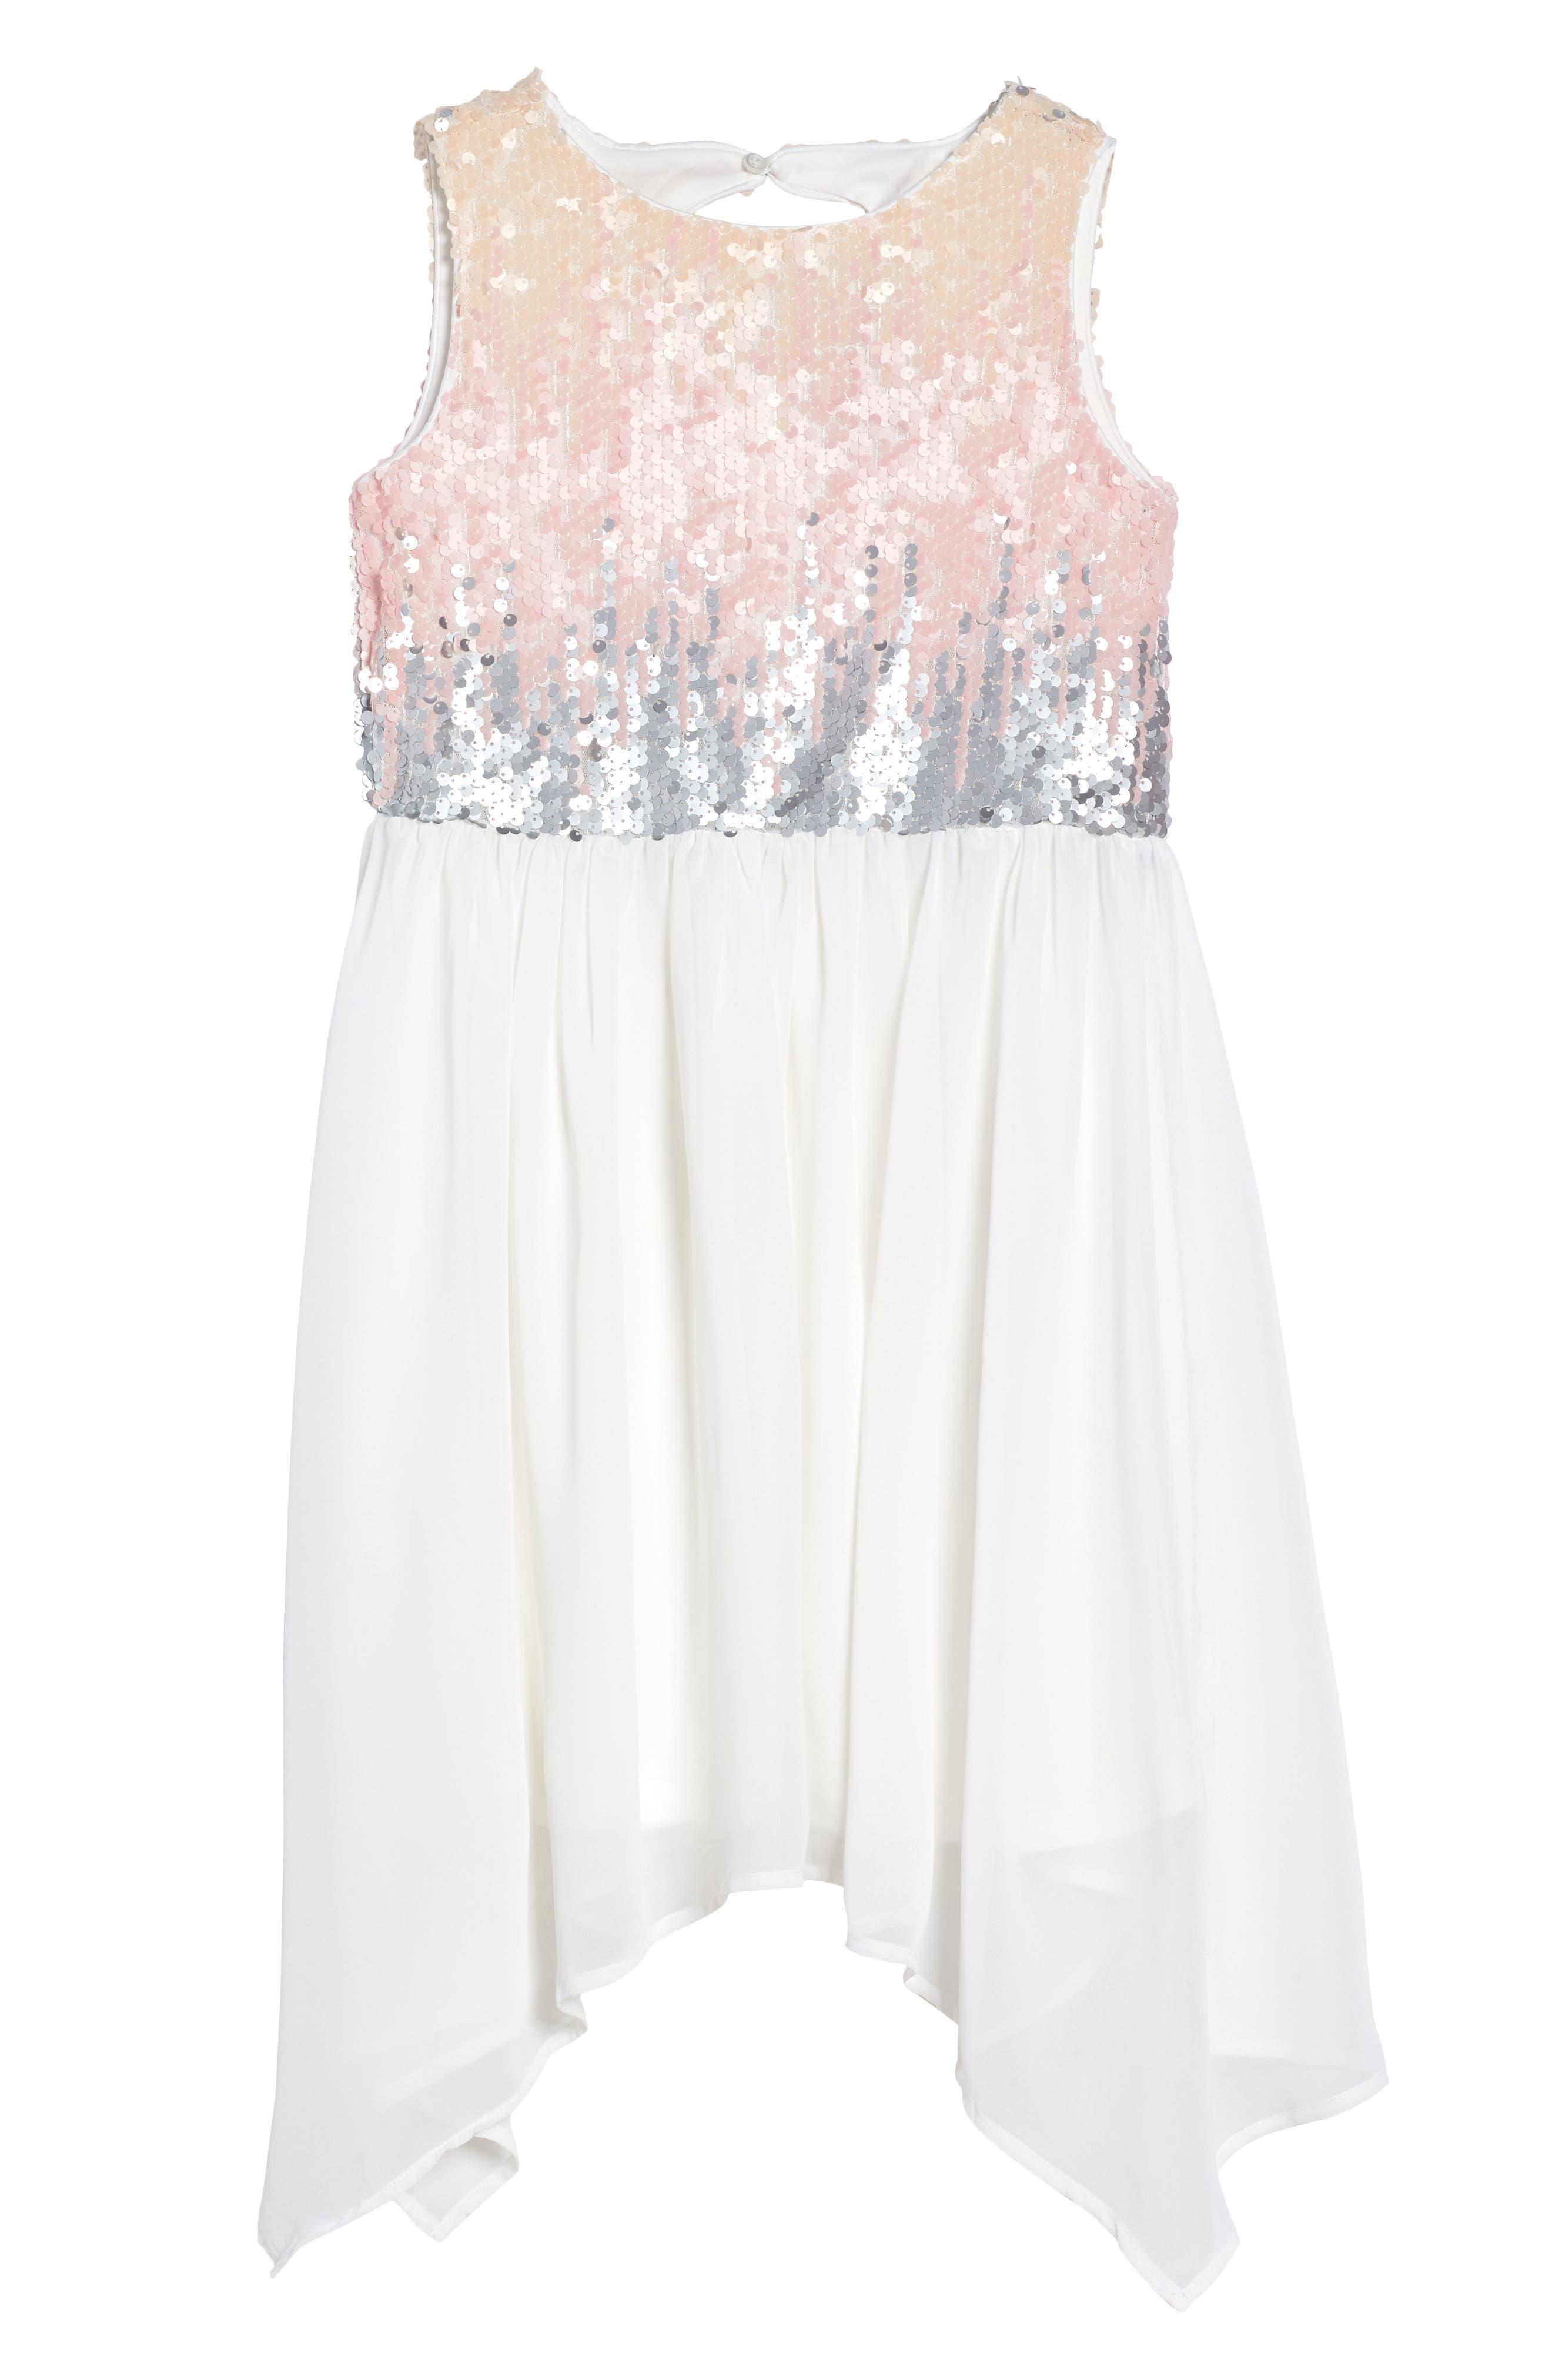 Sequin Bodice Dress,                             Main thumbnail 1, color,                             900